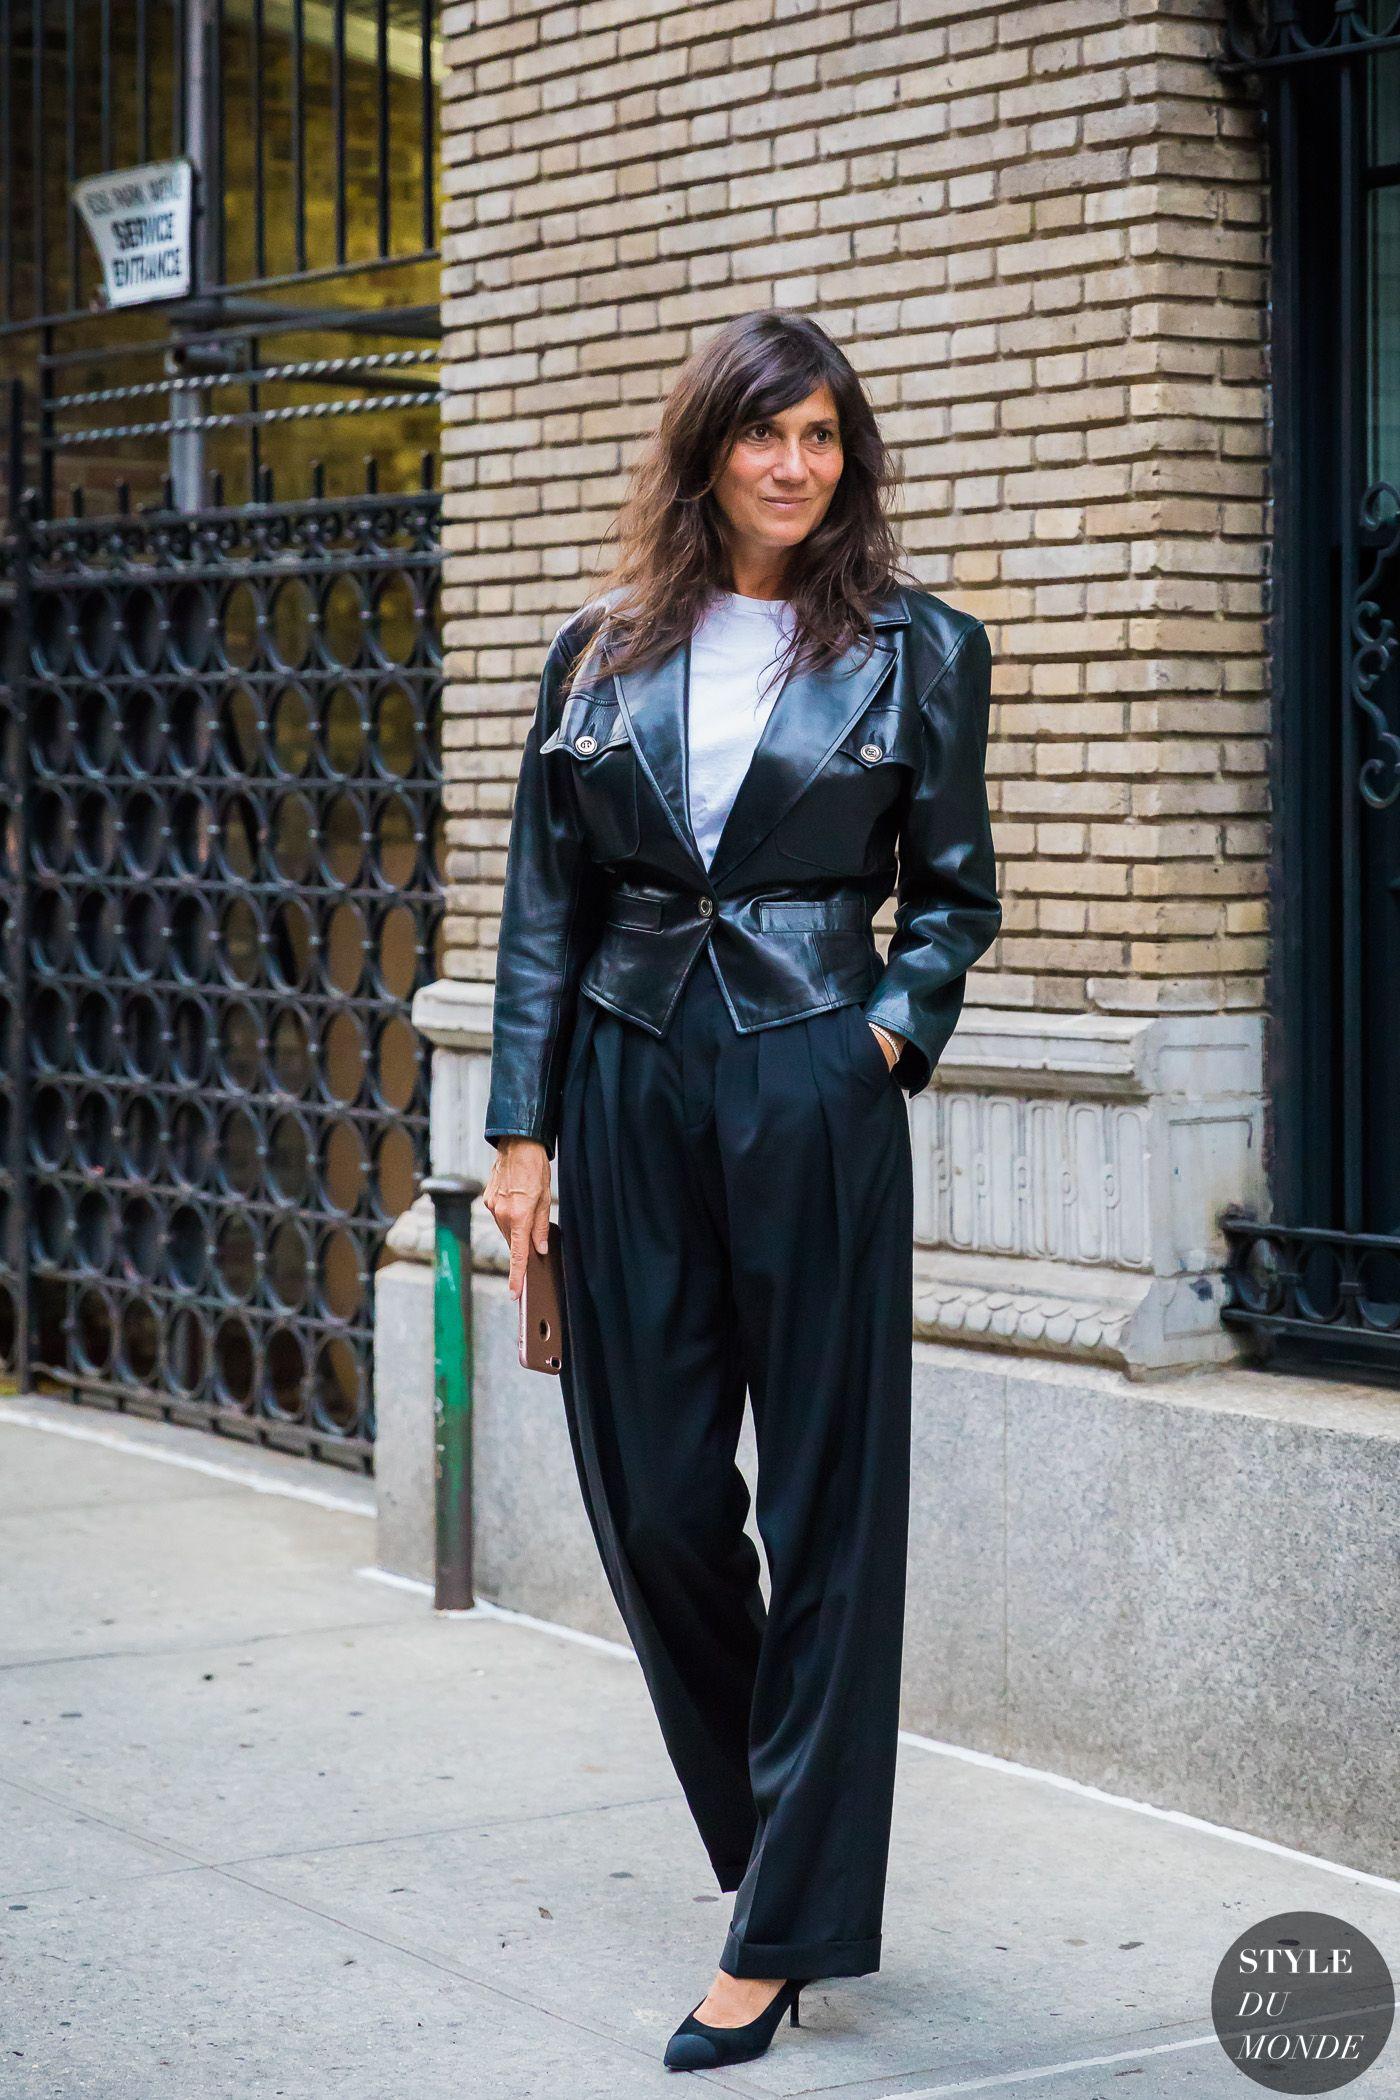 Emmanuelle Alt by STYLEDUMONDE Street Style Fashion Photography 48A3500 1dc2382c3da